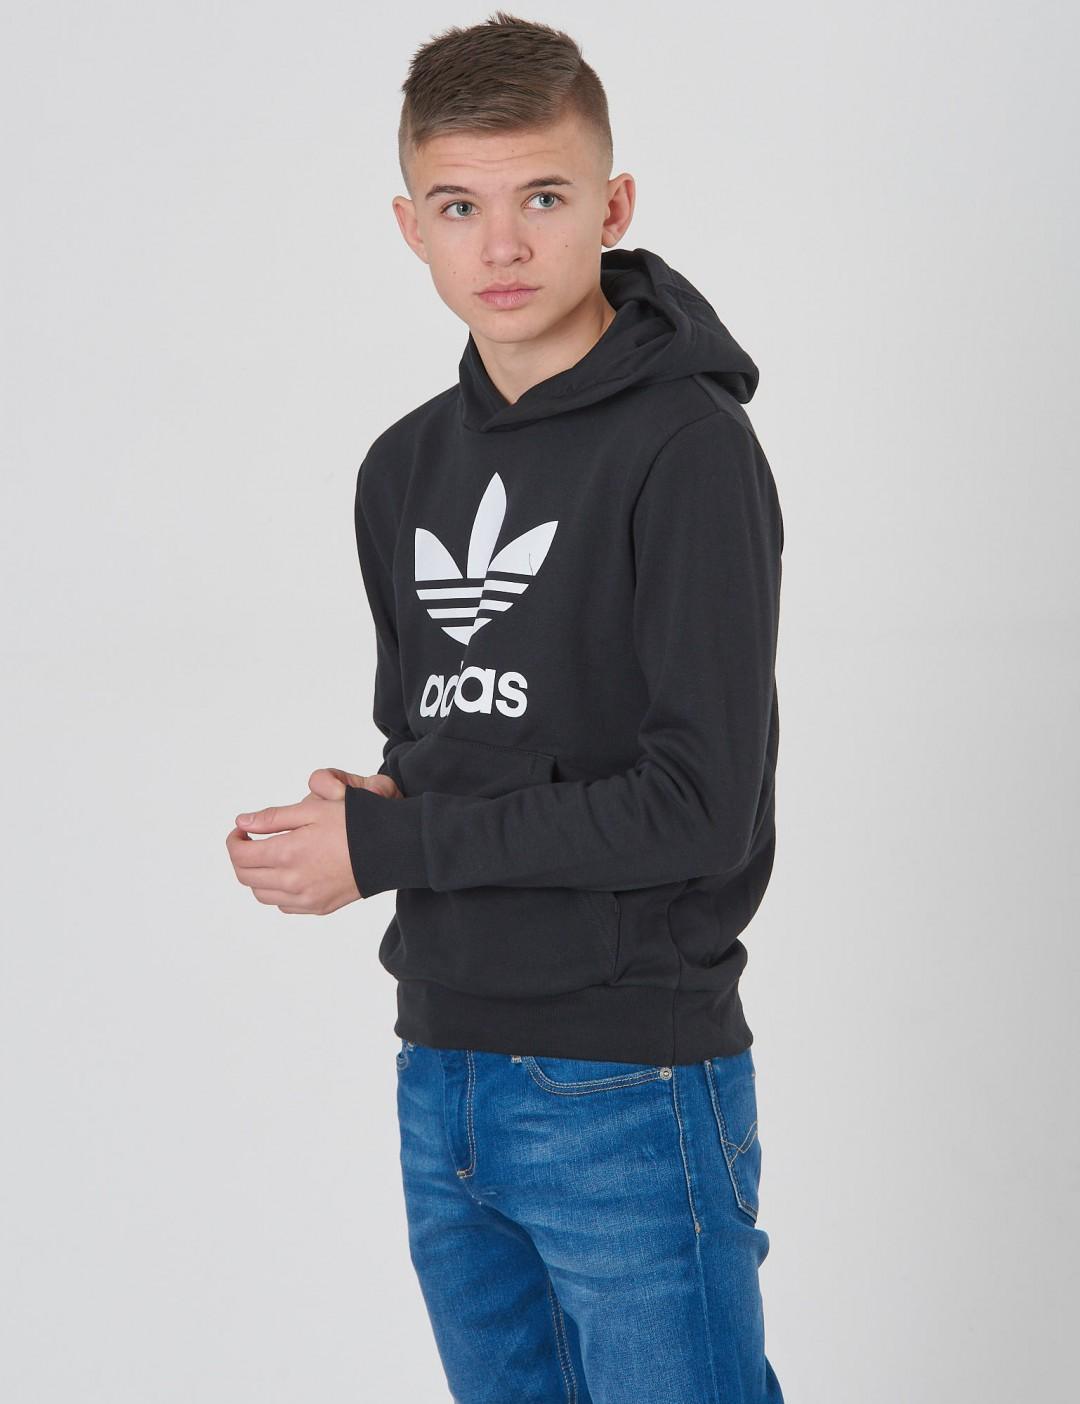 3d9c7725037 Trefoil Hoodie - Zwart - Adidas Originals | KidsBrandStore